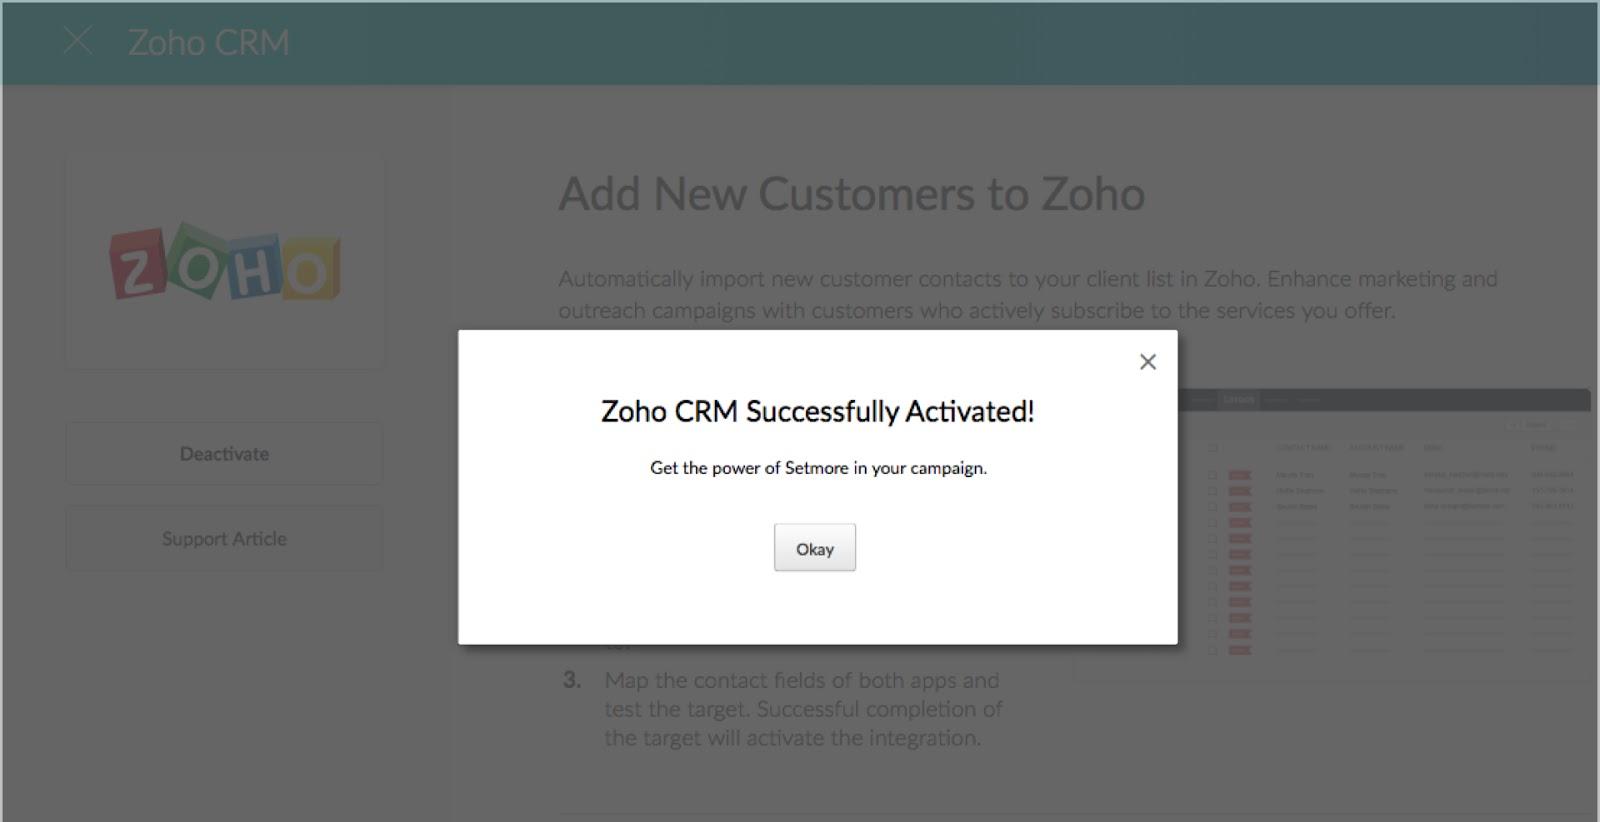 The Setmore-Zoho CRM integration success pop-up message